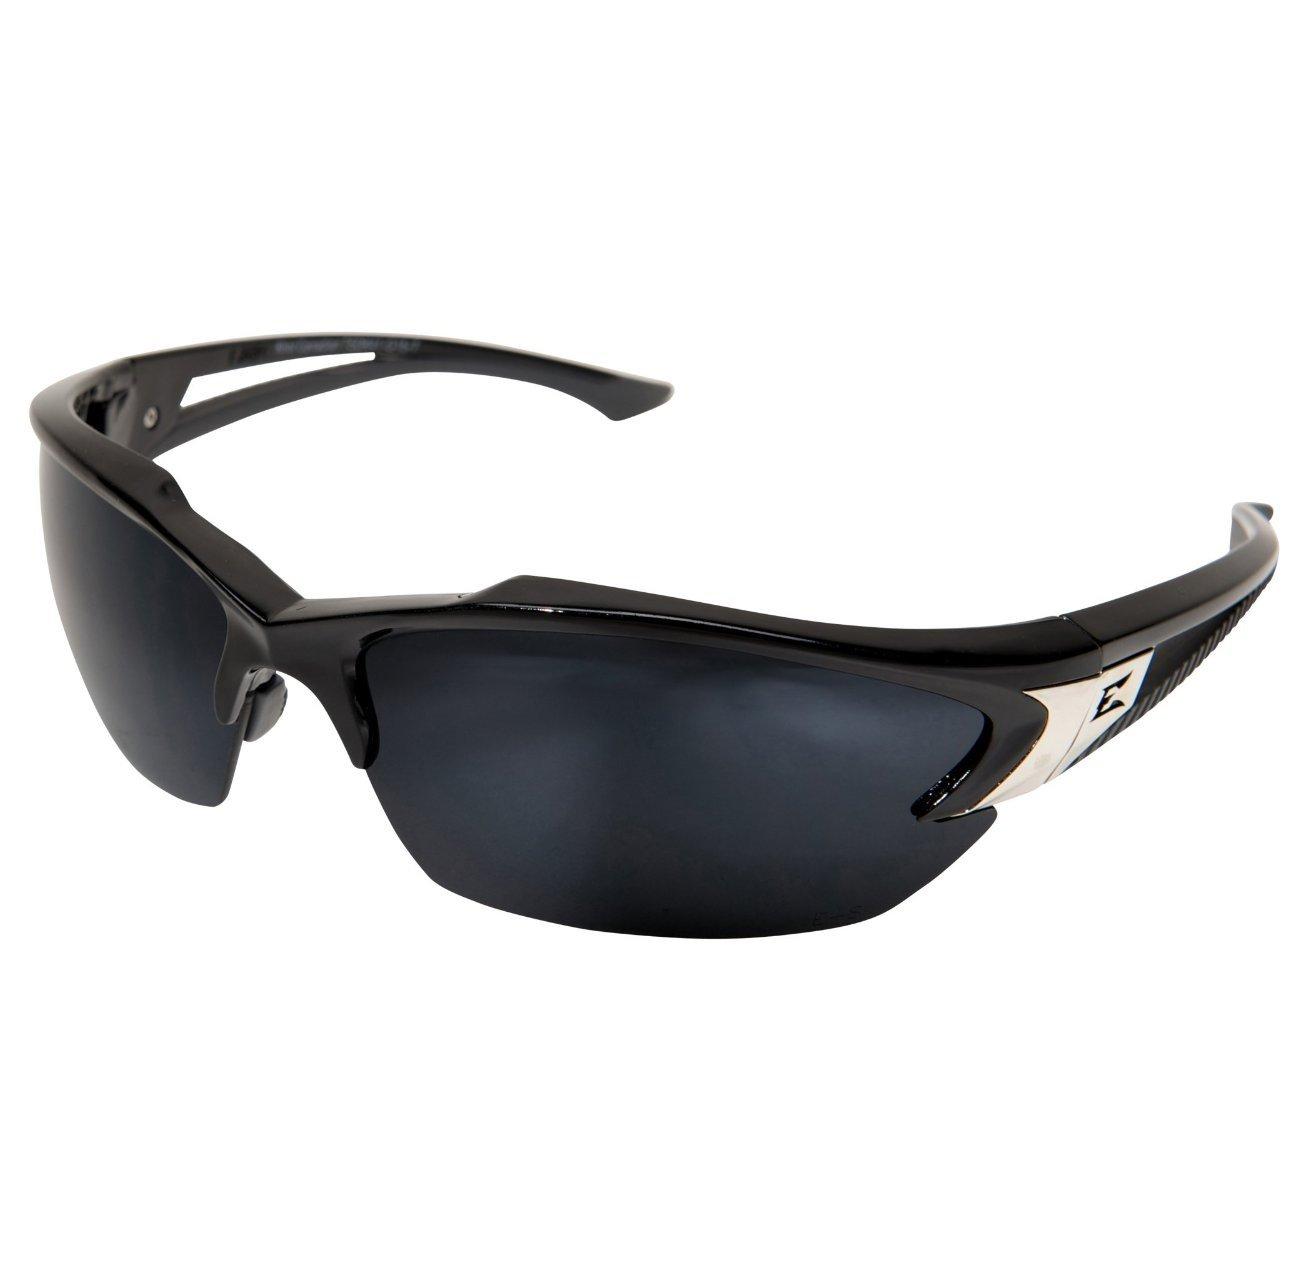 Edge Eyewear G-15 Silver Mirror Polarized Eyewear, Anti-Fog